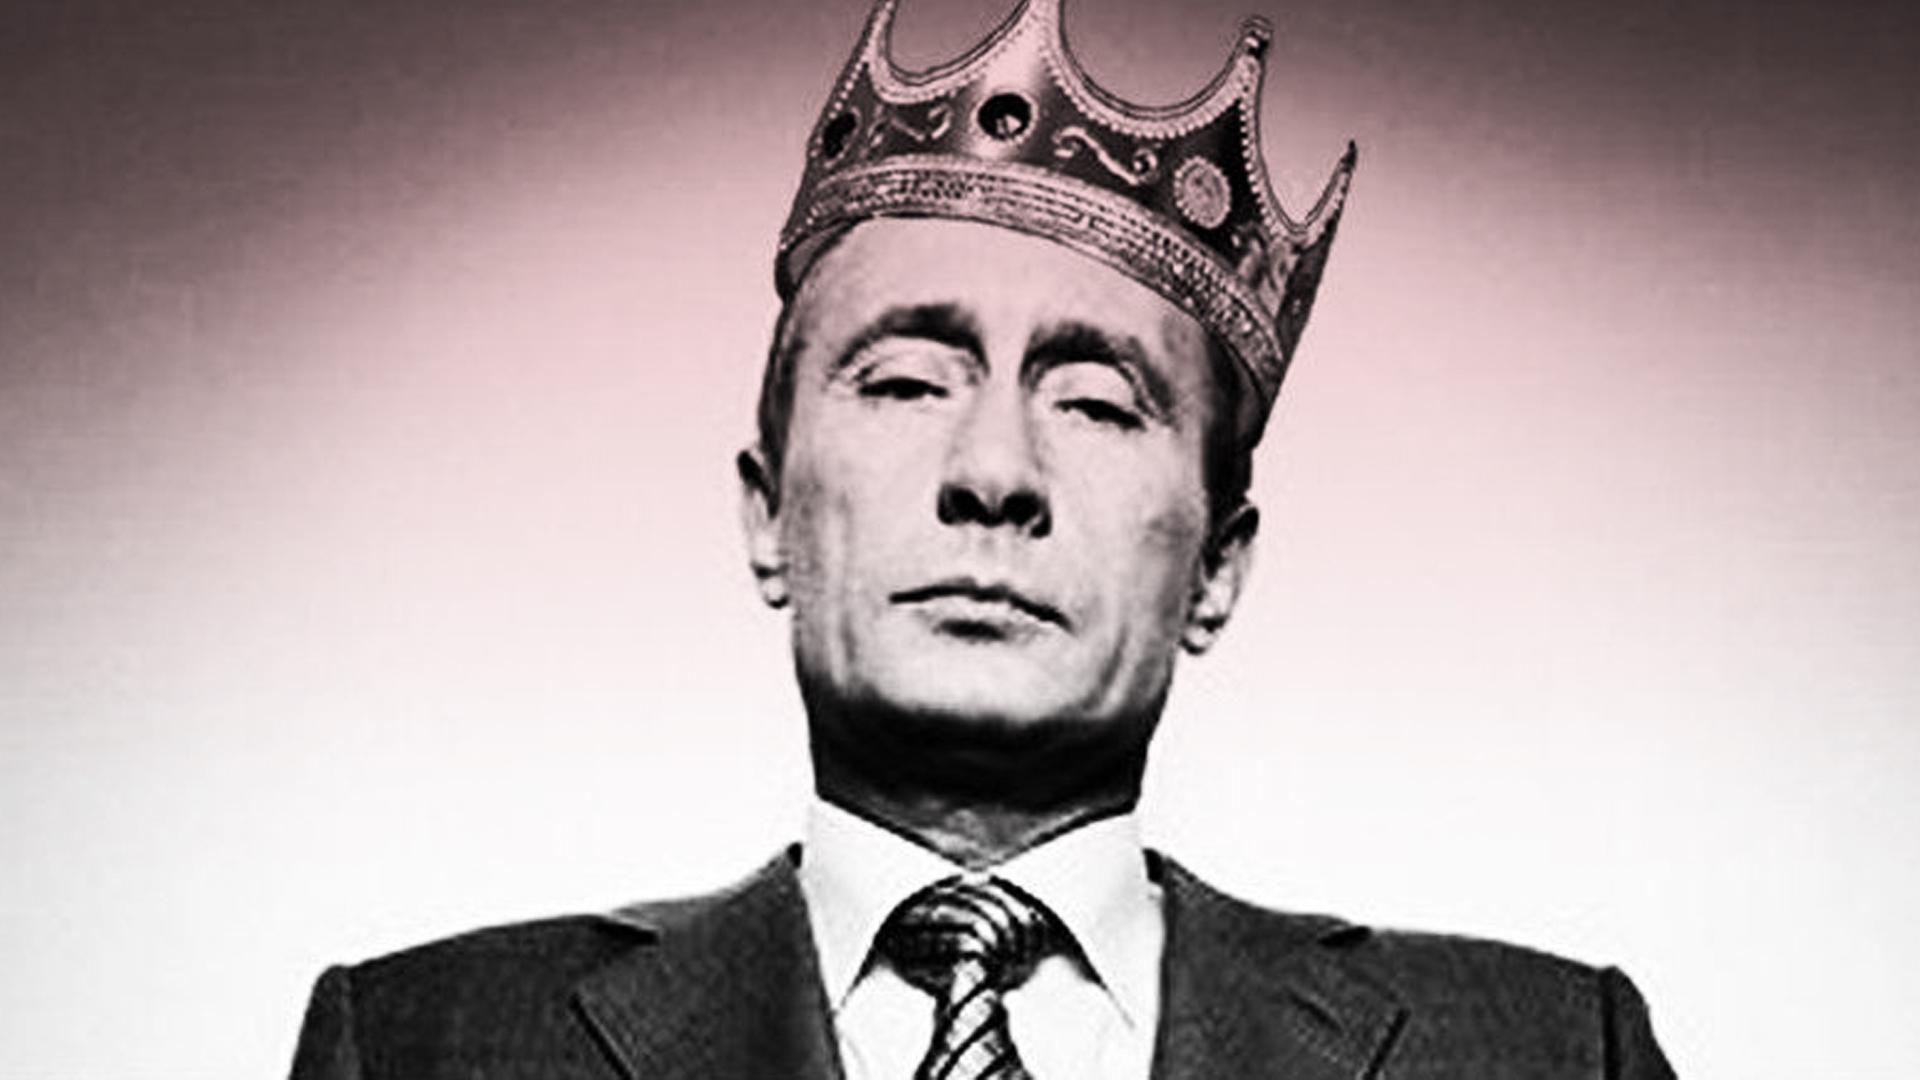 https://24tv.ua/resources/photos/news/202005/1338355_13632481.jpg?1588749192000